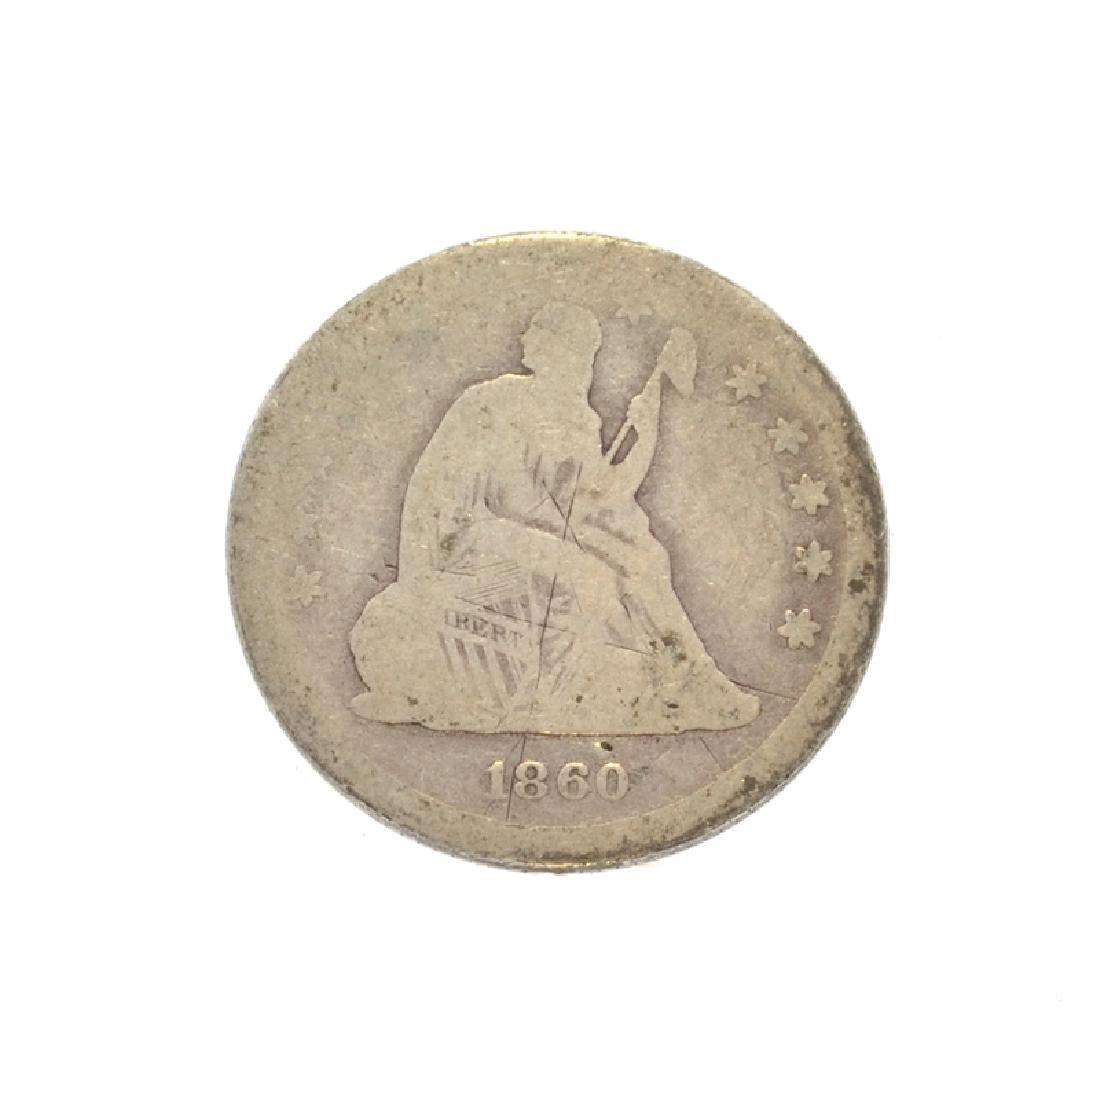 1860 Liberty Seated Quarter Dollar Coin